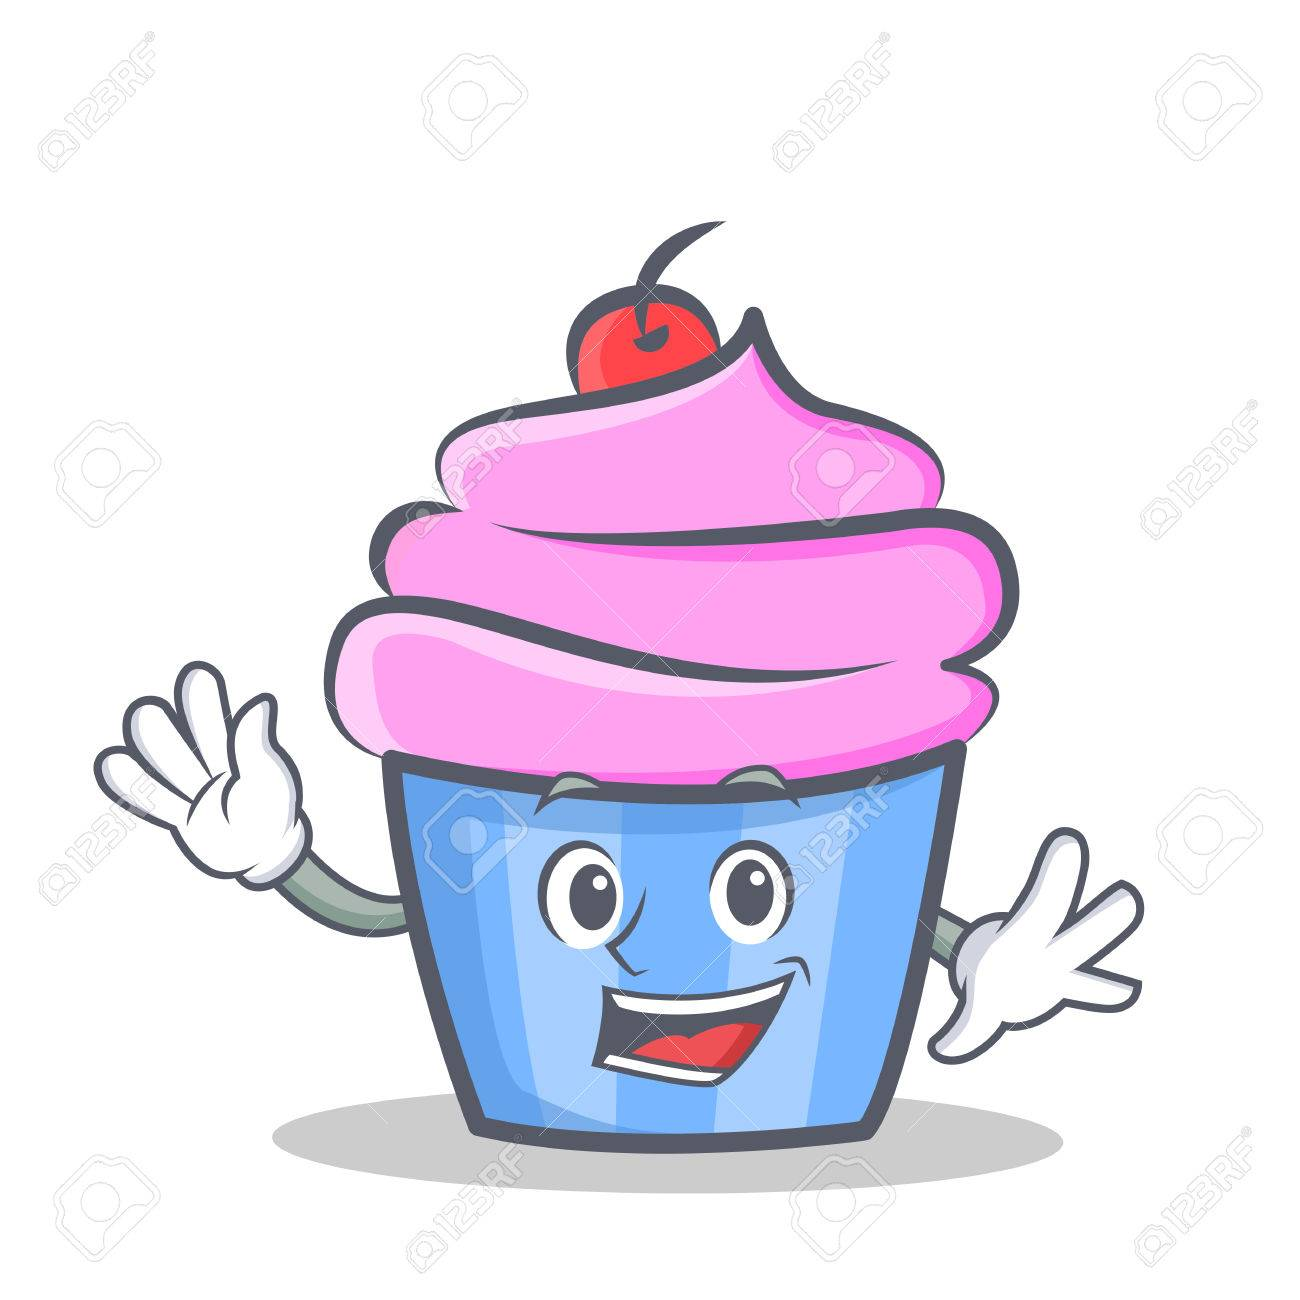 Waving cupcake character cartoon style vector illustration - 82892836